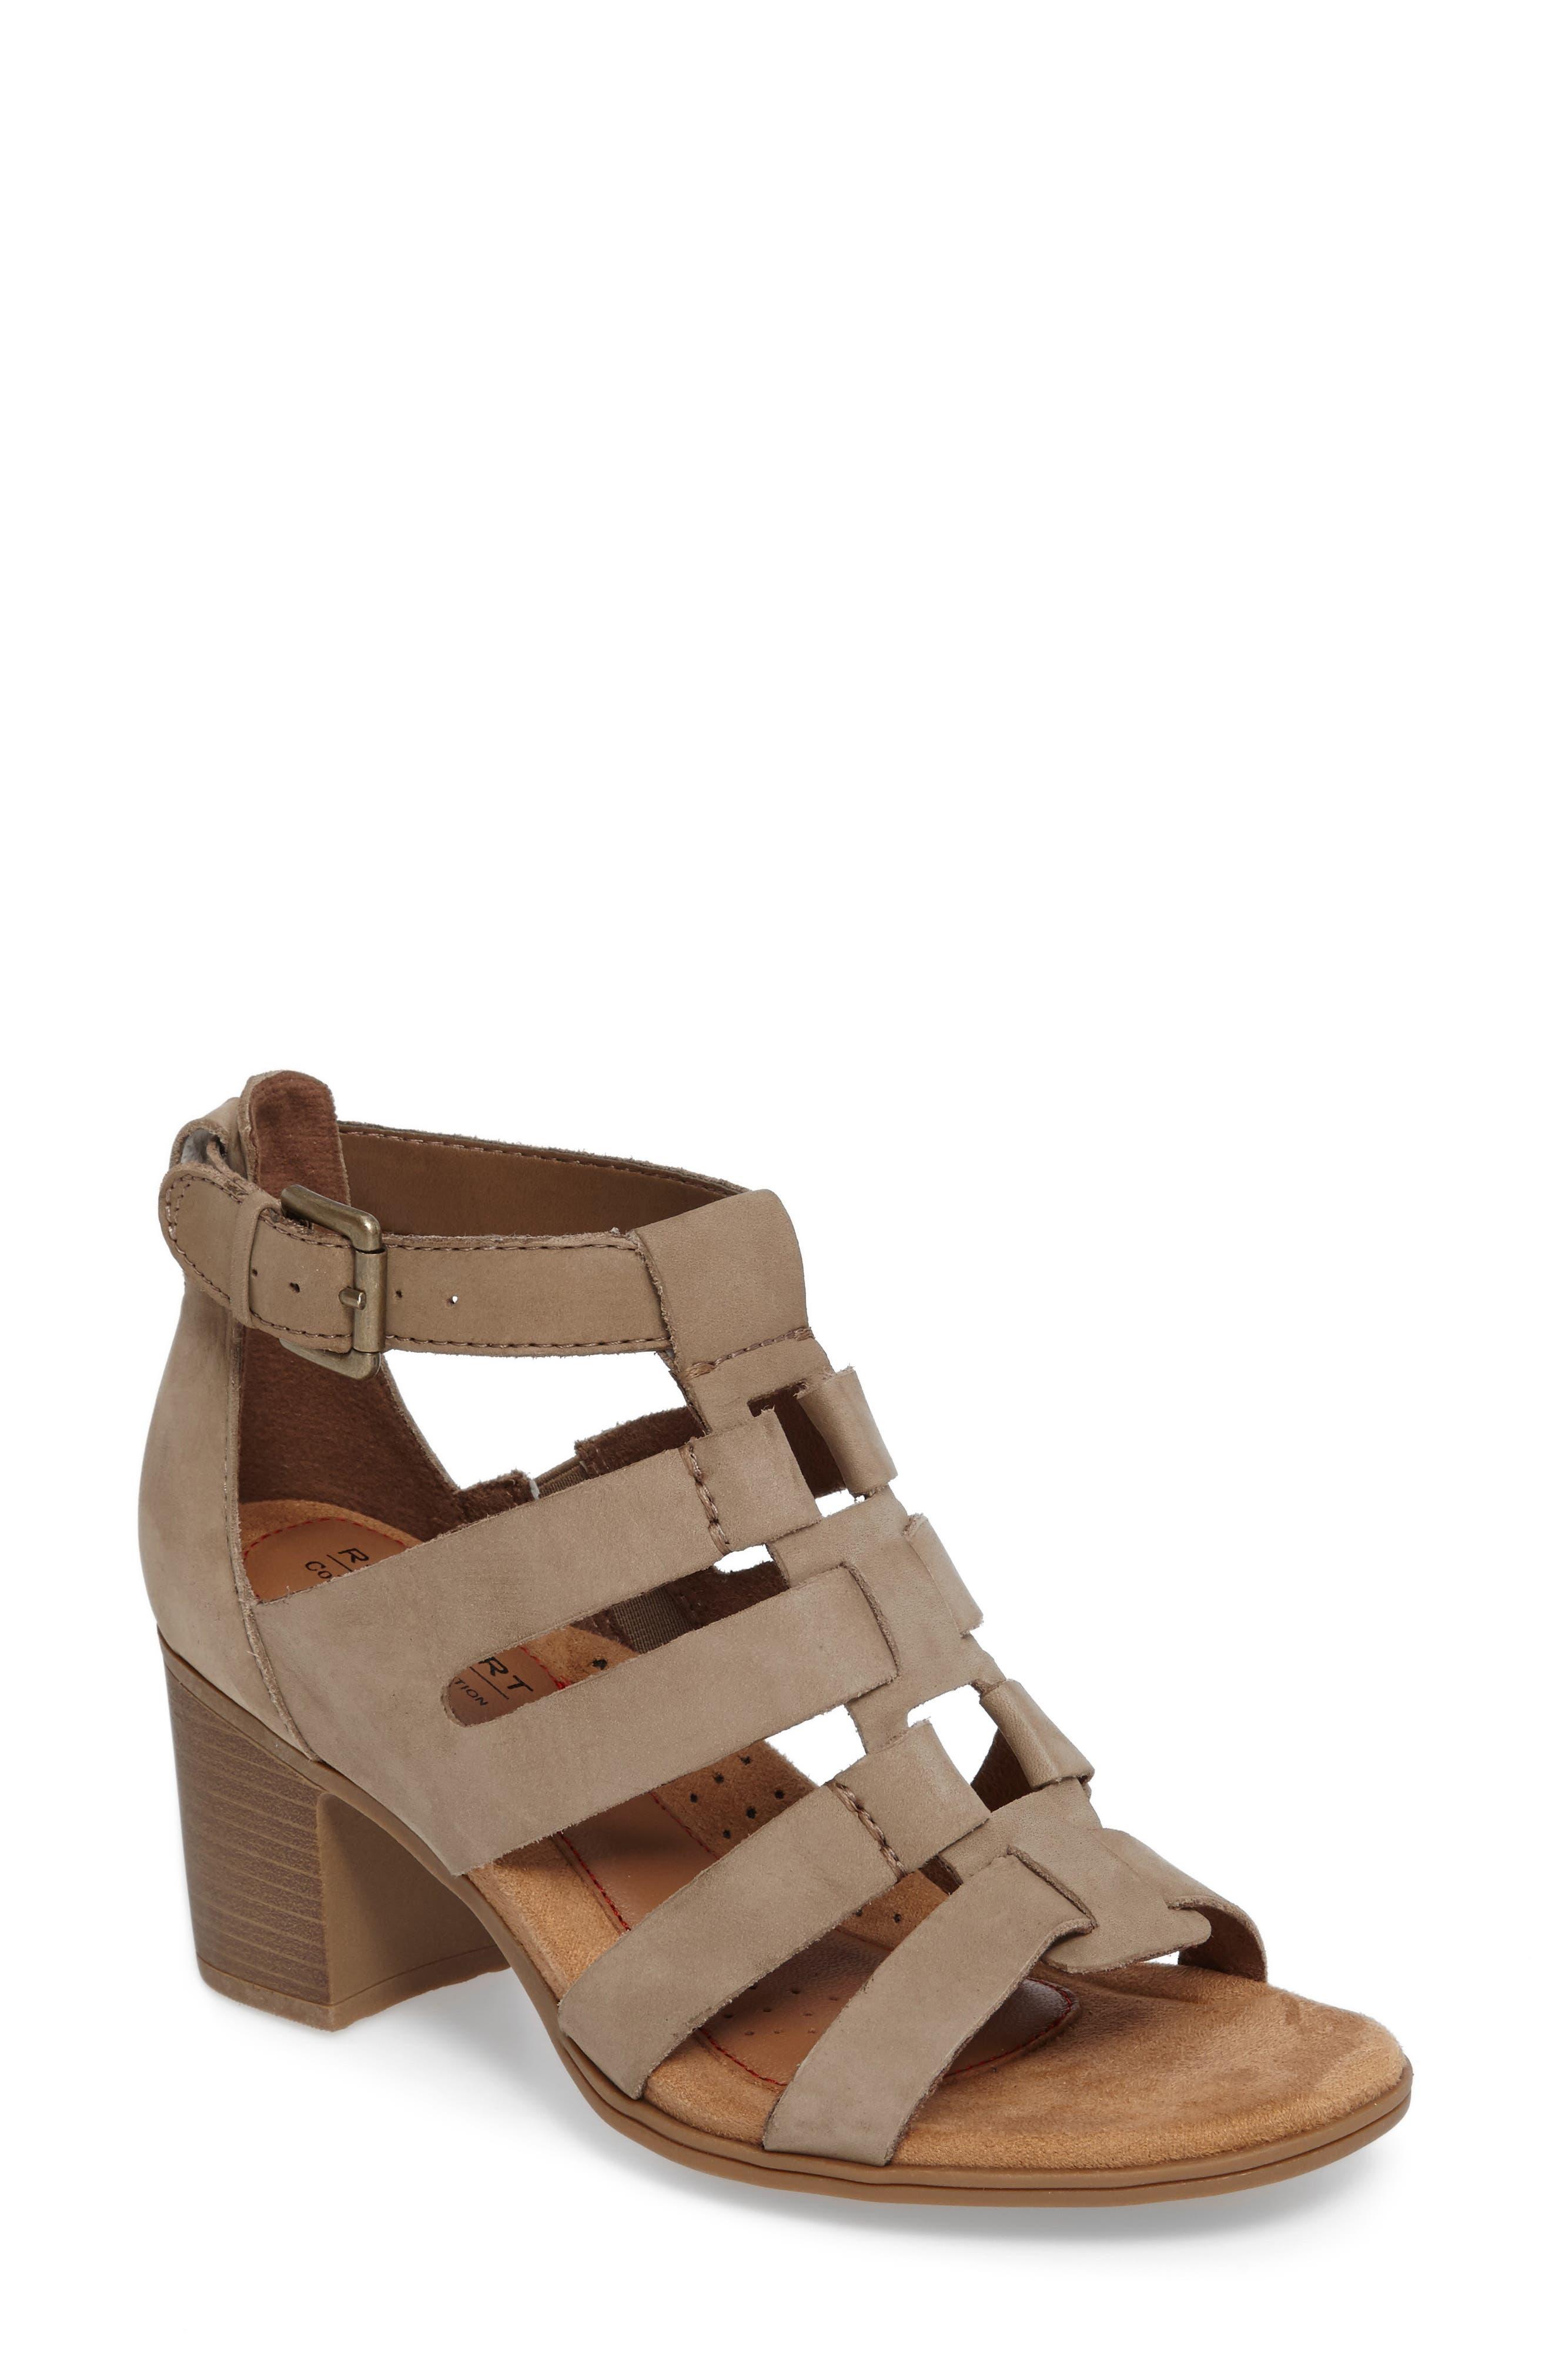 Main Image - Rockport Cobb Hill Hattie Block Heel Gladiator Sandal (Women)